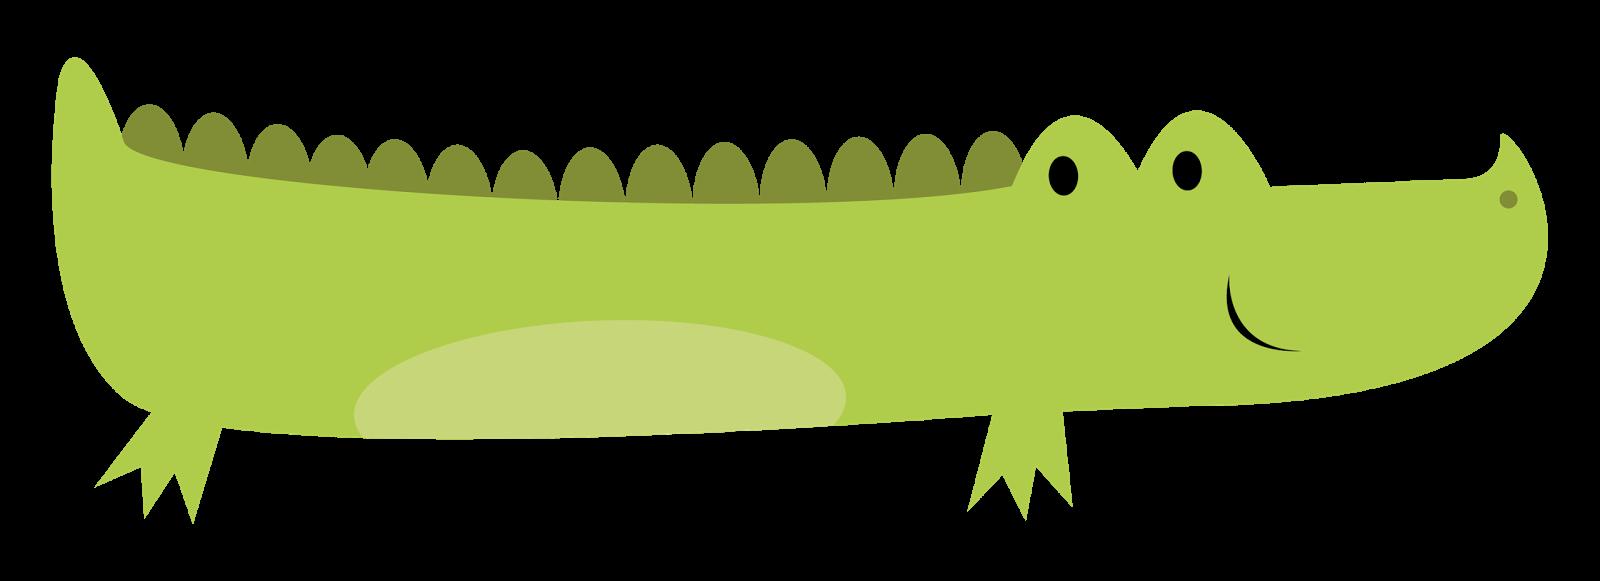 Peter Pan Crocodile Clipart.